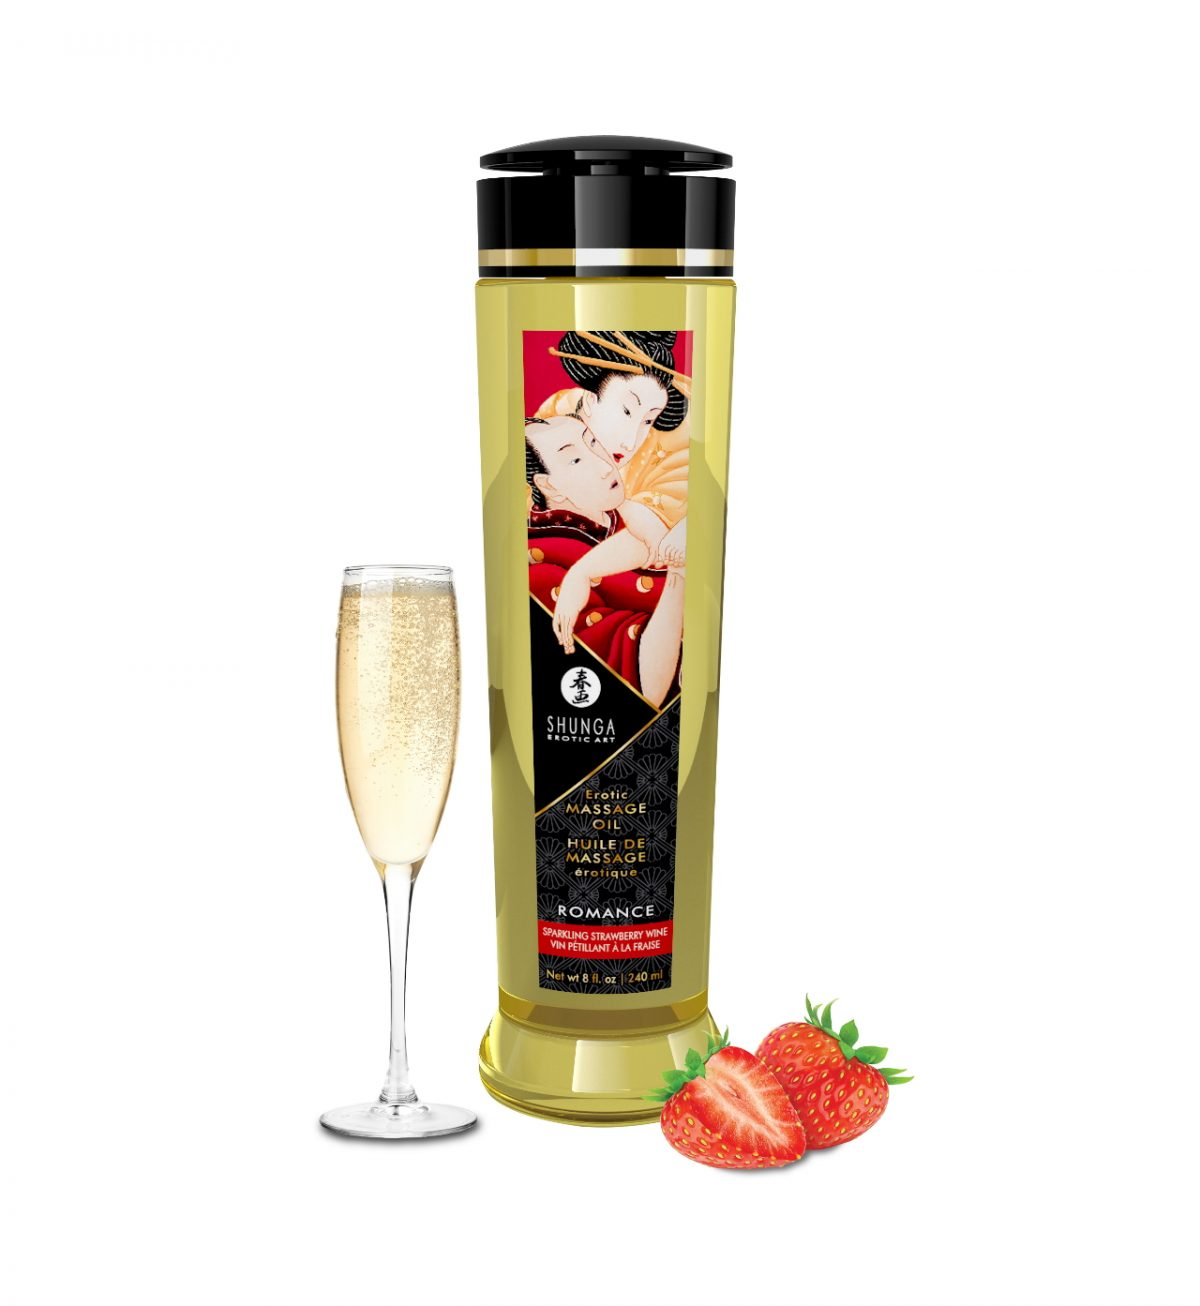 Massasjeolje – Champagne og jordbær - Sensuell massasjeolje med sensuell aroma - Shunga